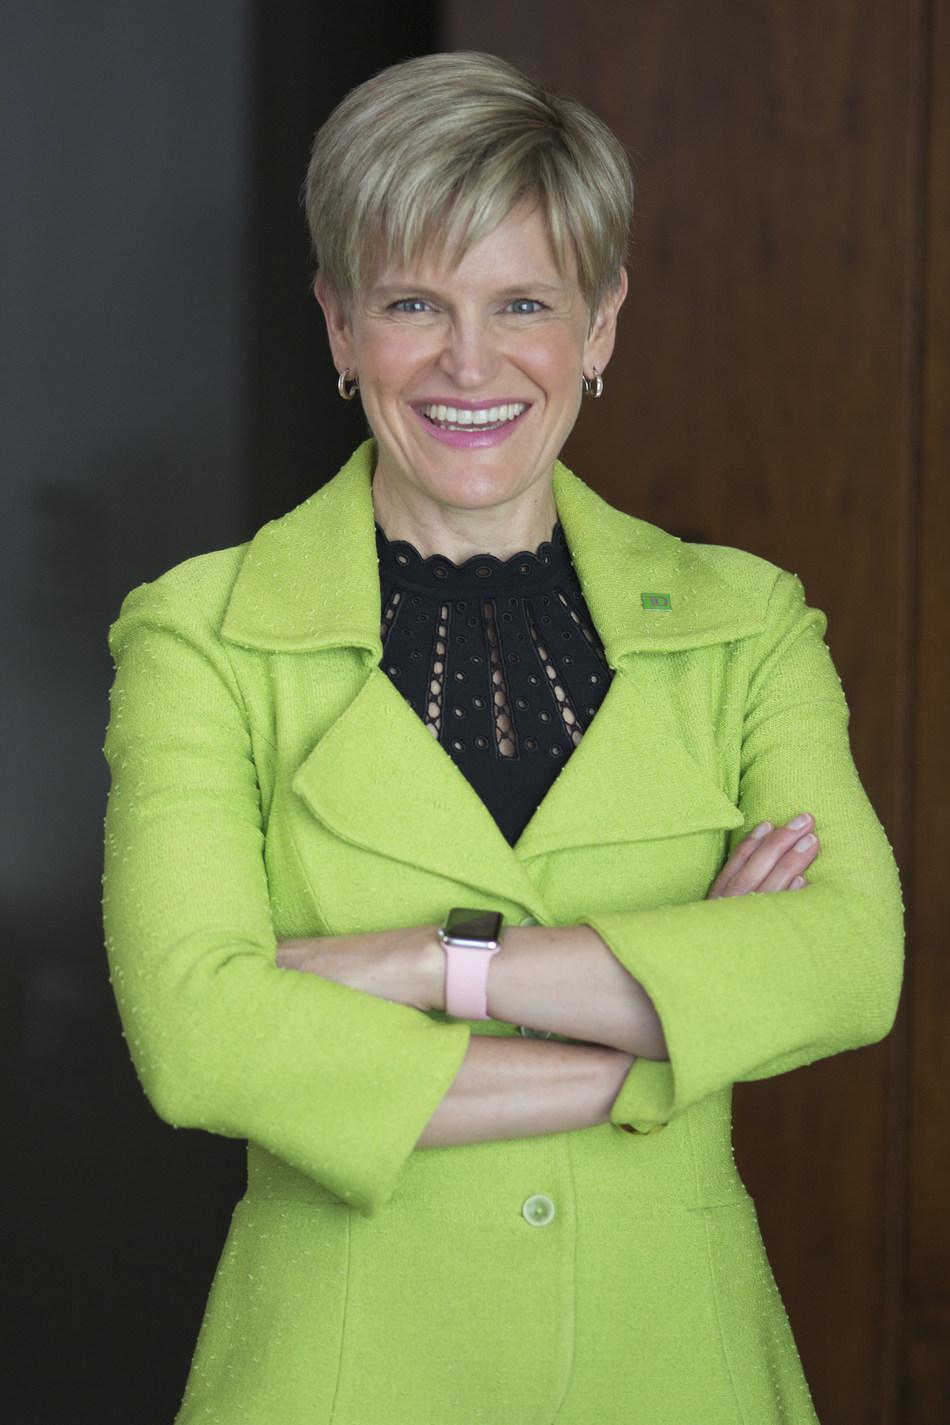 Teri Currie (Groupe CNW/Association des banquiers canadiens)